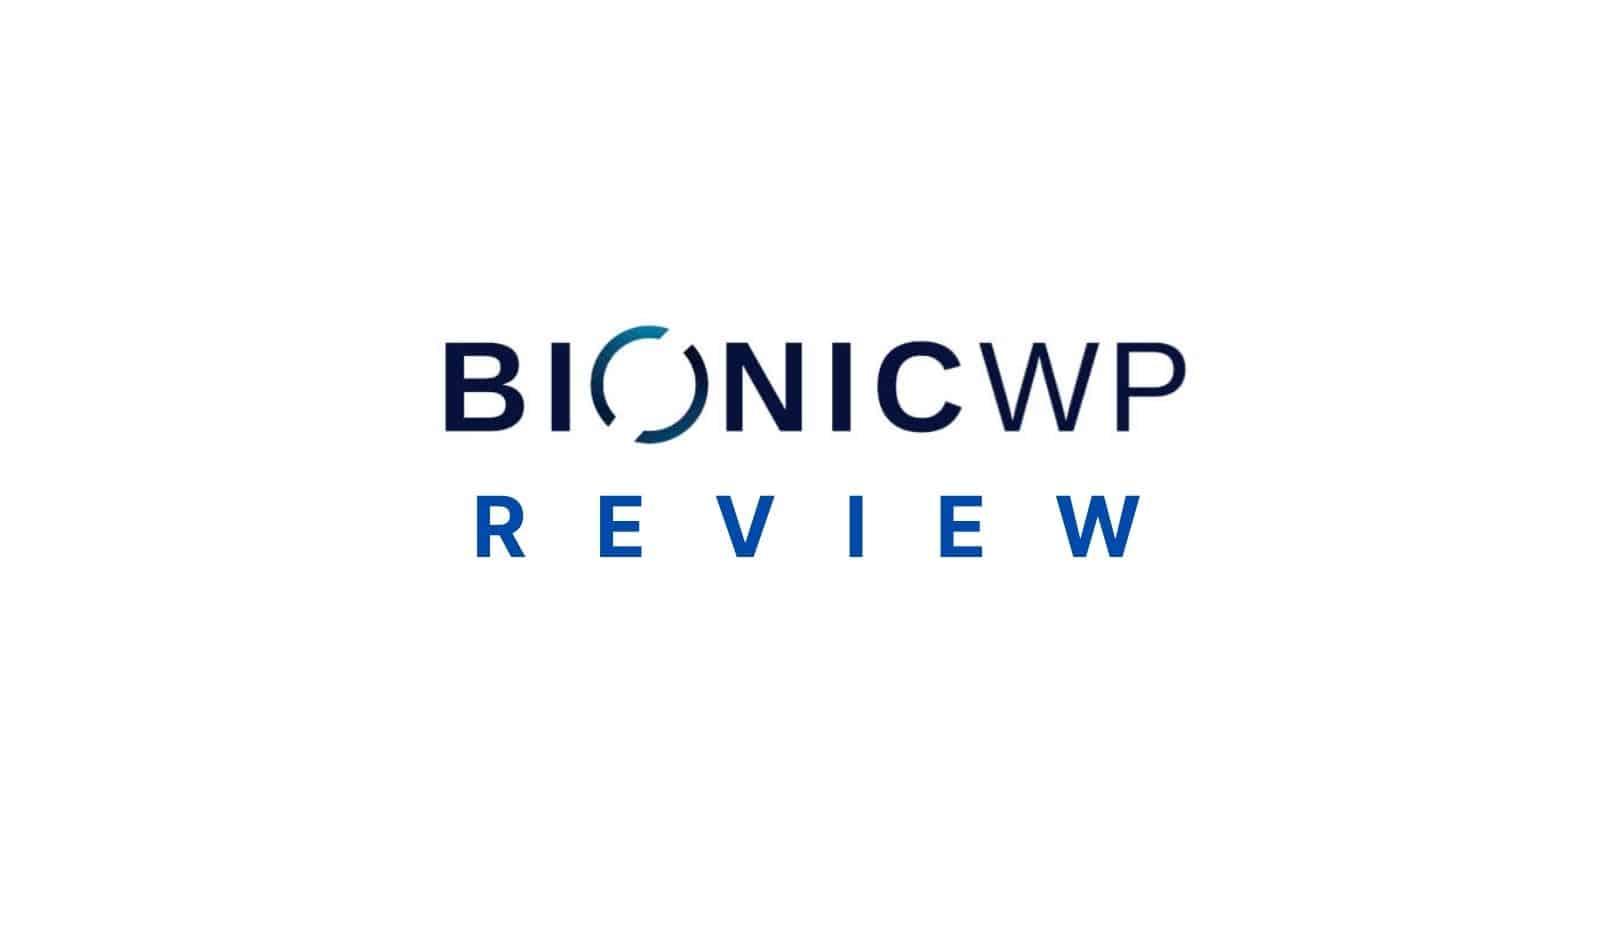 bionicwp review, Image, Gaurav Tiwari